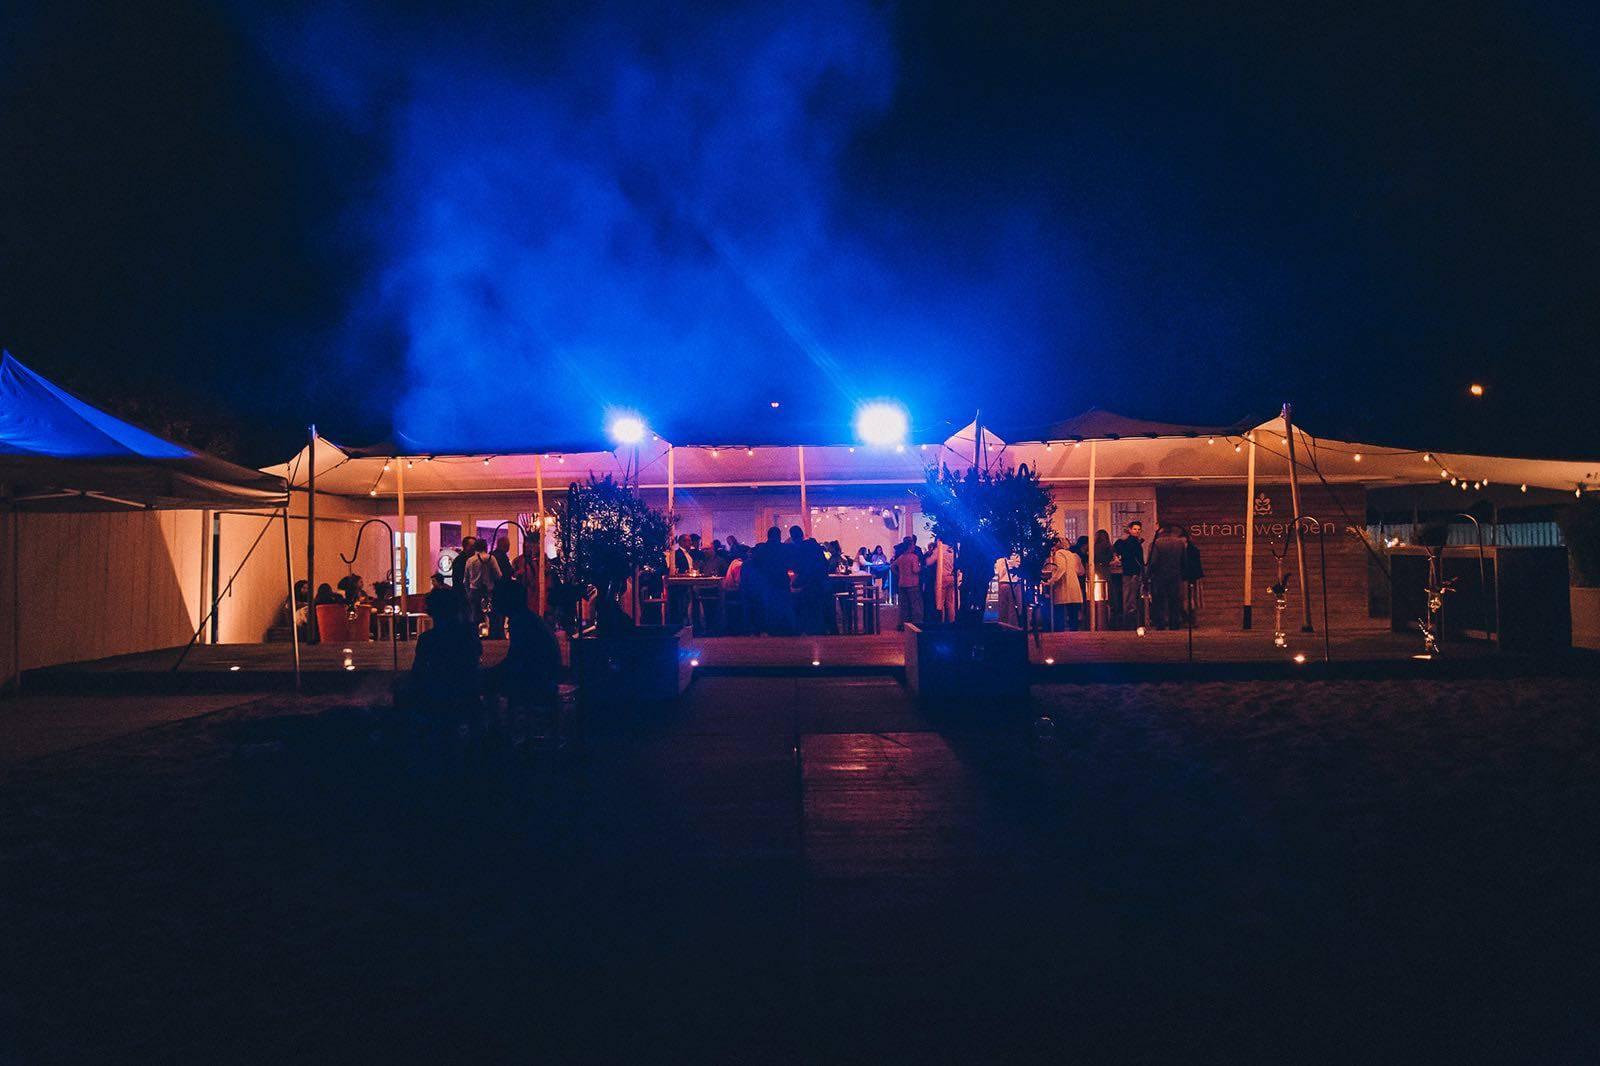 Strantwerpen - Feestzaal - Trouwzaal - Trouwen op het Strand - Fotograaf Aiki Photography - House of Weddings - 8